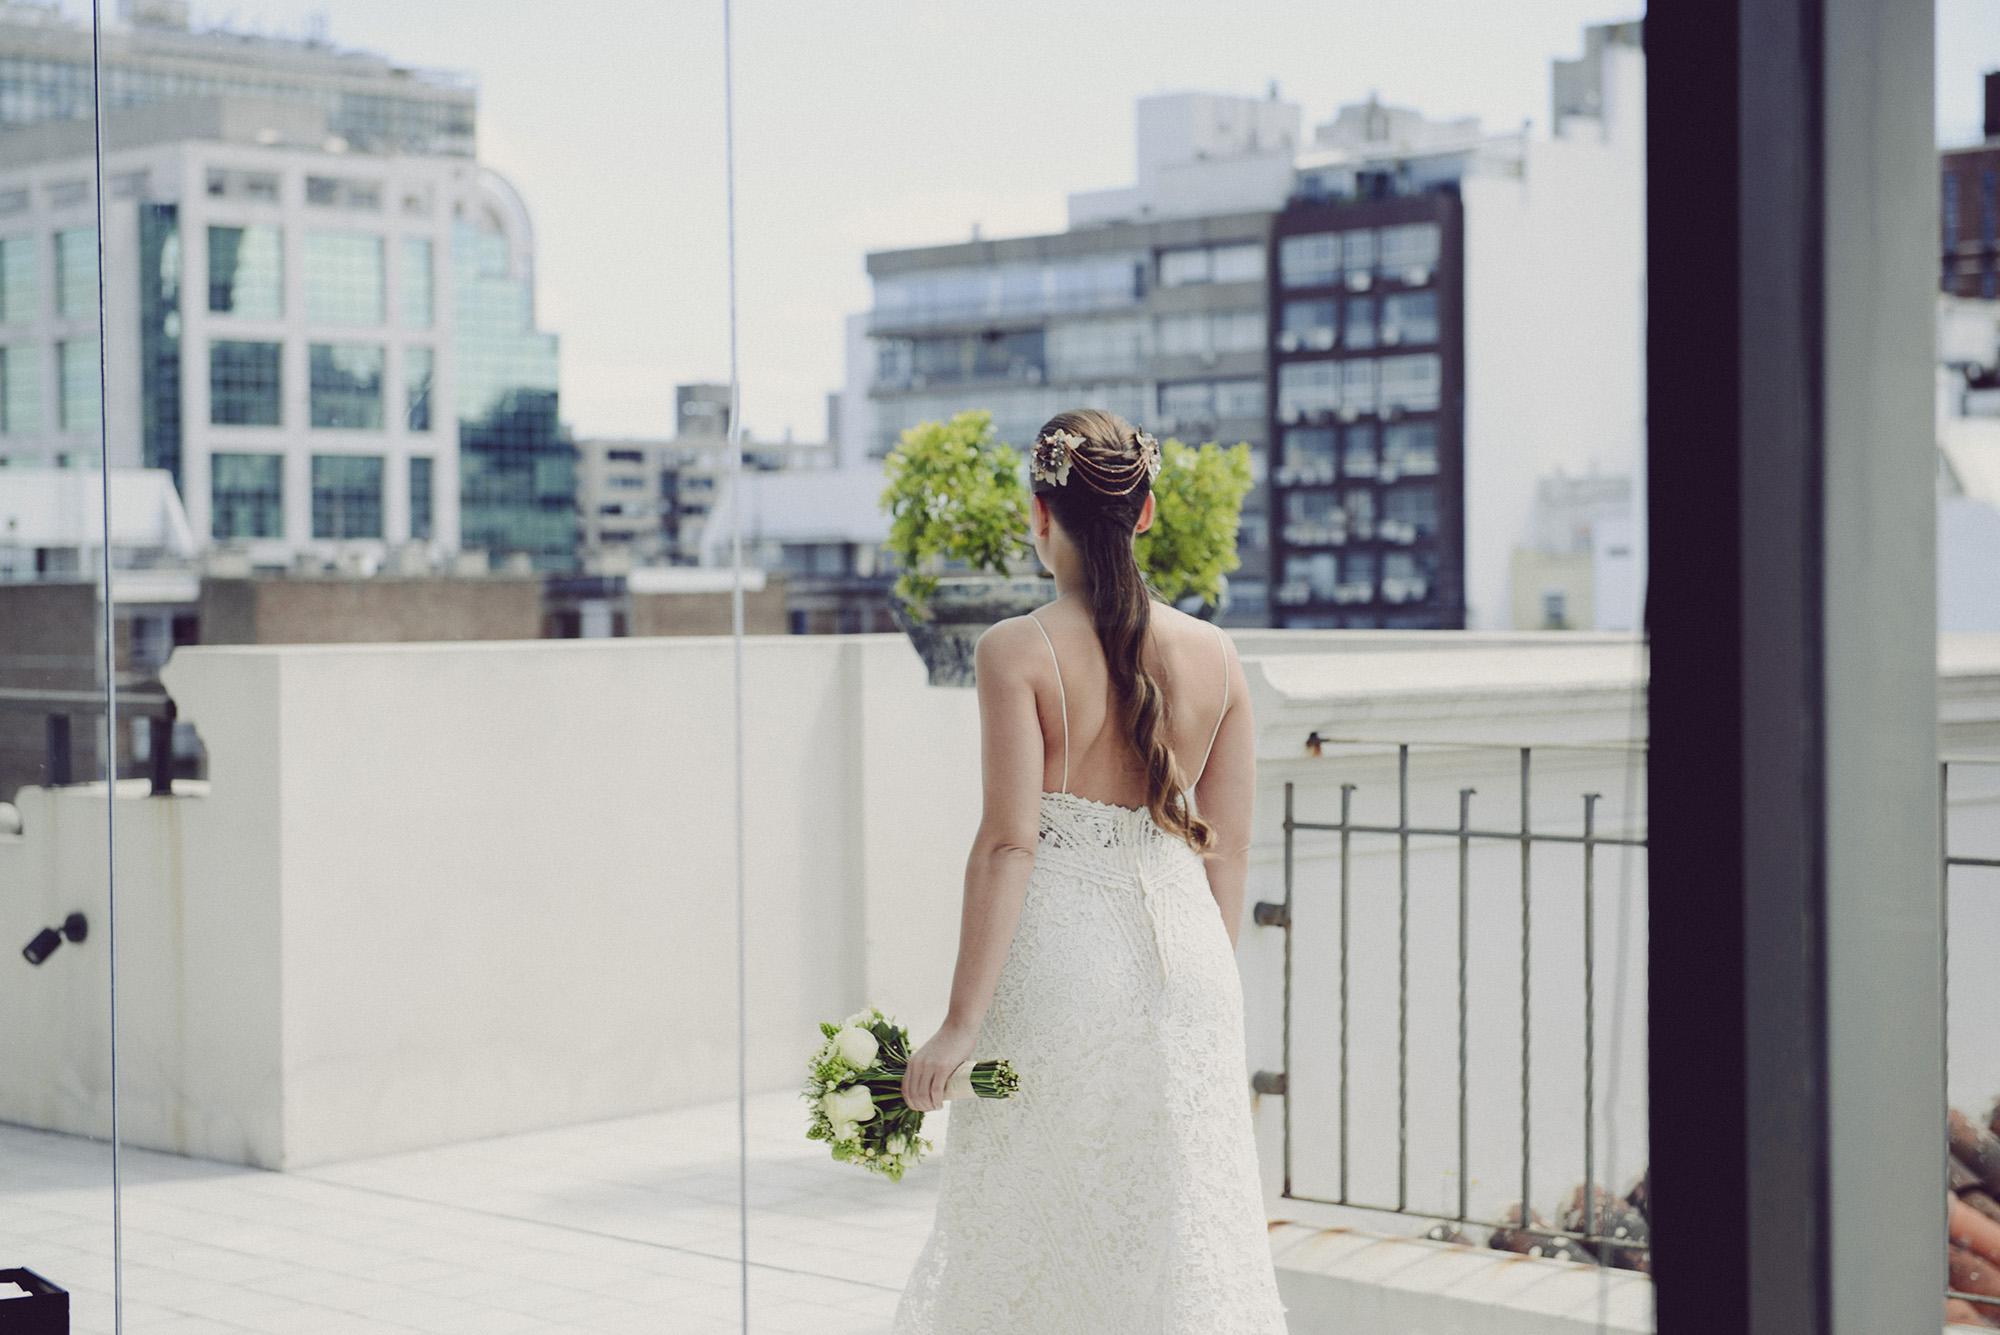 patricia-riba-casamiento-montevideo-uruguay-lindolfo-26